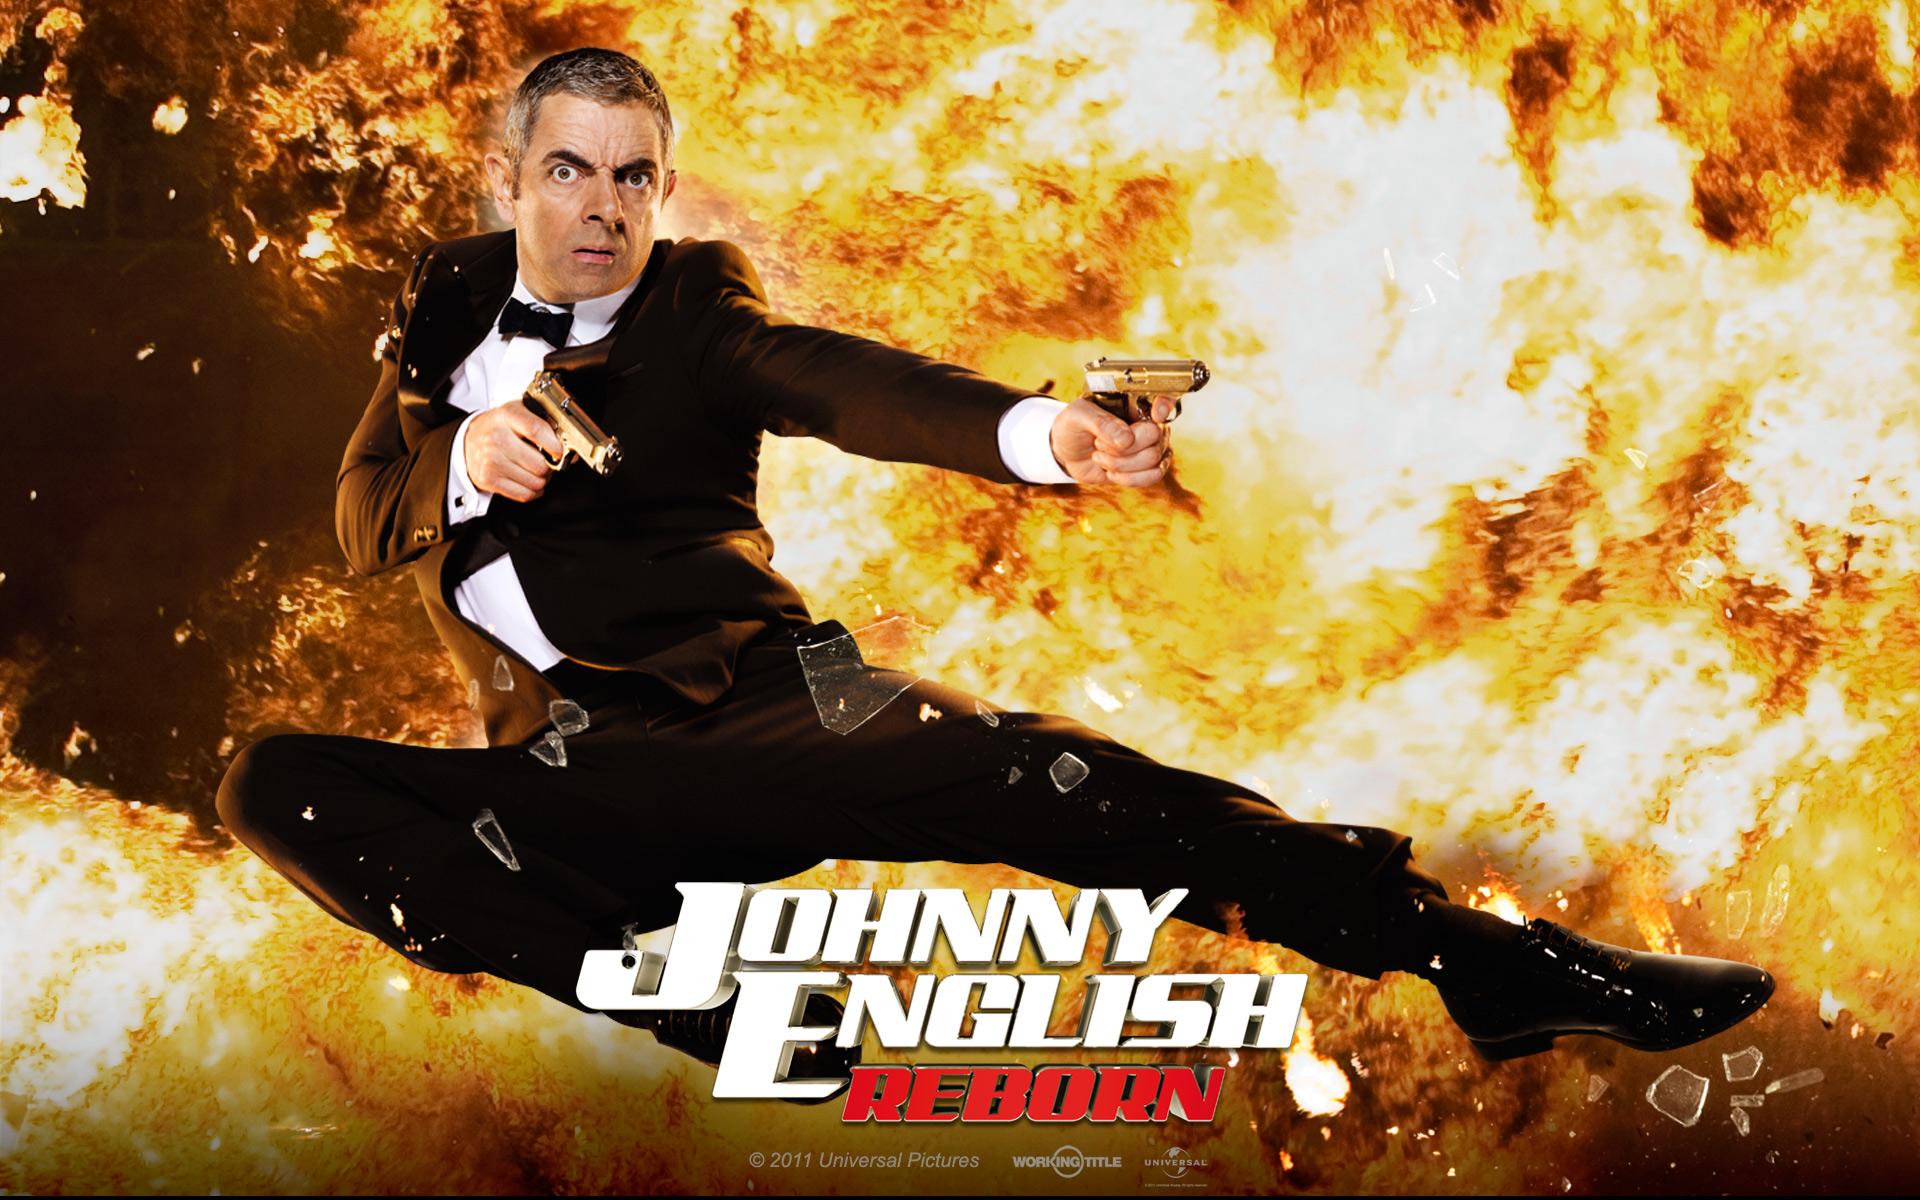 Агент Джонни Инглиш: Перезагрузка (2 11) фильм